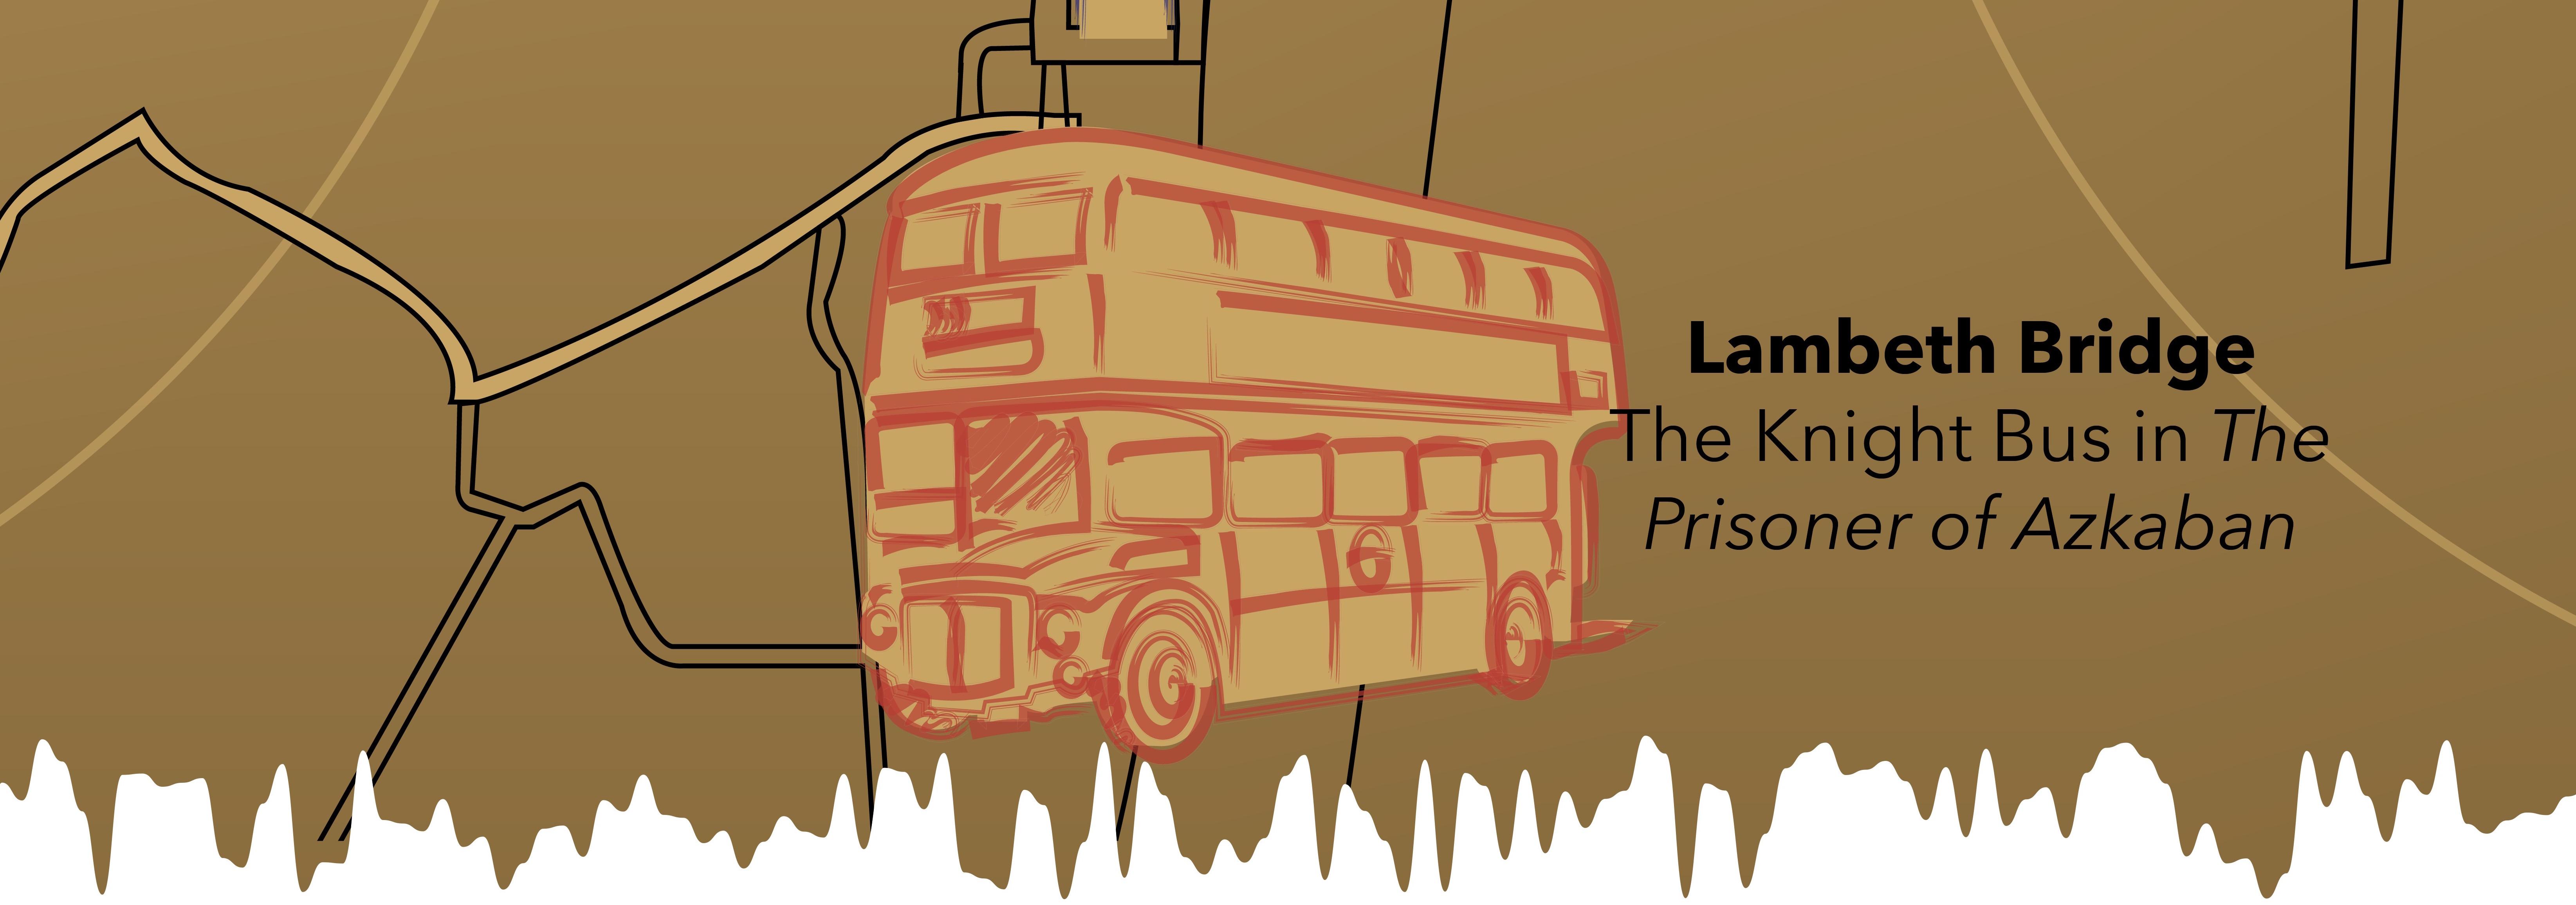 Knight Bus Map on bales bus, getaway bus, fool bus, miller bus, gallop bus, triple decker bus, diesel pusher bus, giggle bus, night bus, raja bus, astronaut bus, bearcat bus, kipp bus, london bus, scamp bus, mermaid bus, khalifa bus, mighty bus, brute bus,